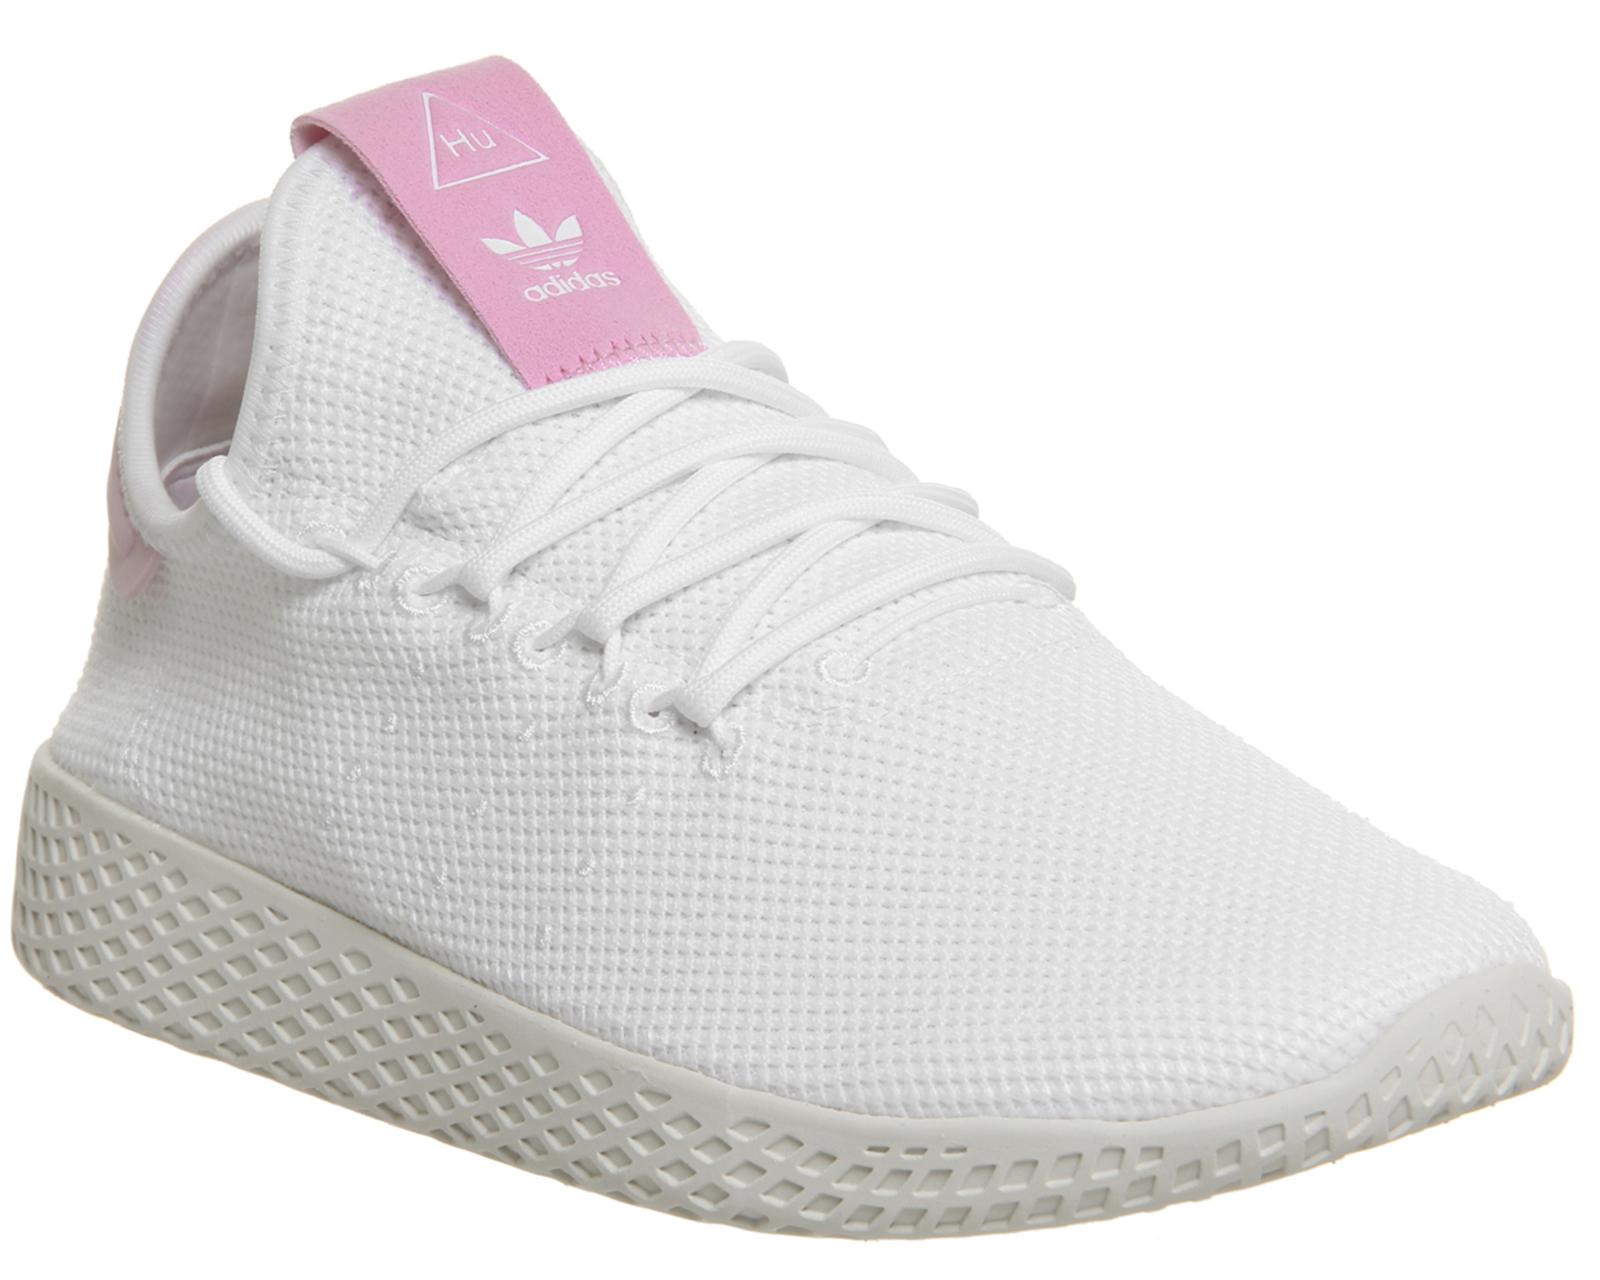 donna adidas PW TENNIS HU Bianco Bianco Rosa F Scarpe da ginnastica